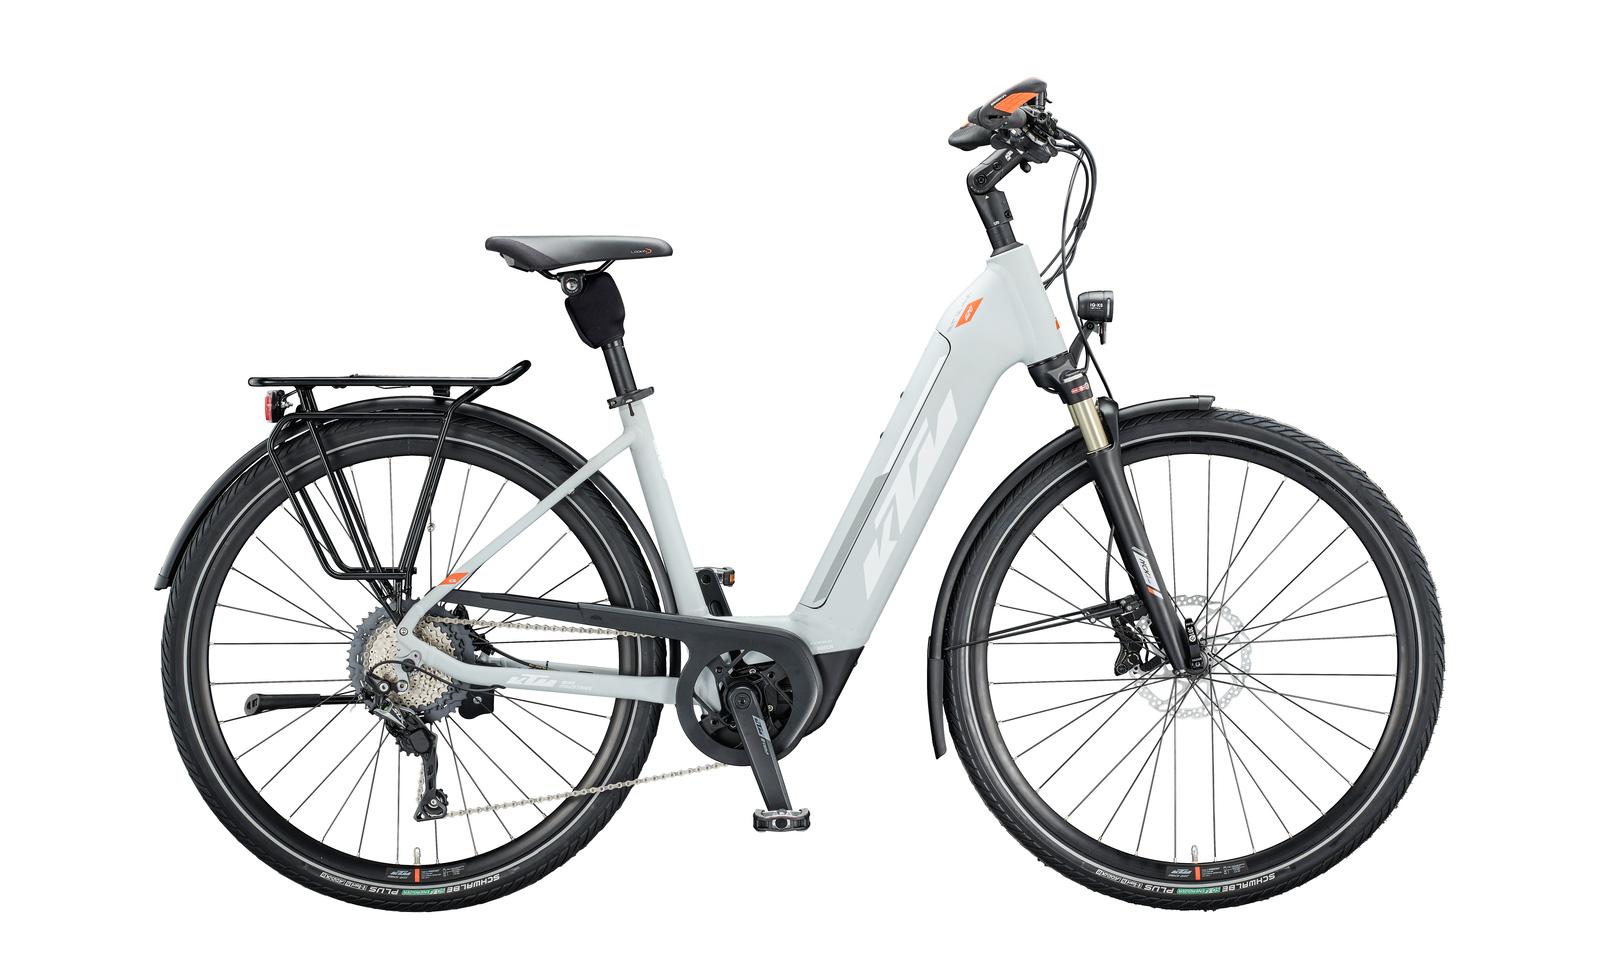 Biciclete electrice KTM E-Onroad MACINA STYLE 620 1x11 Shimano SLX